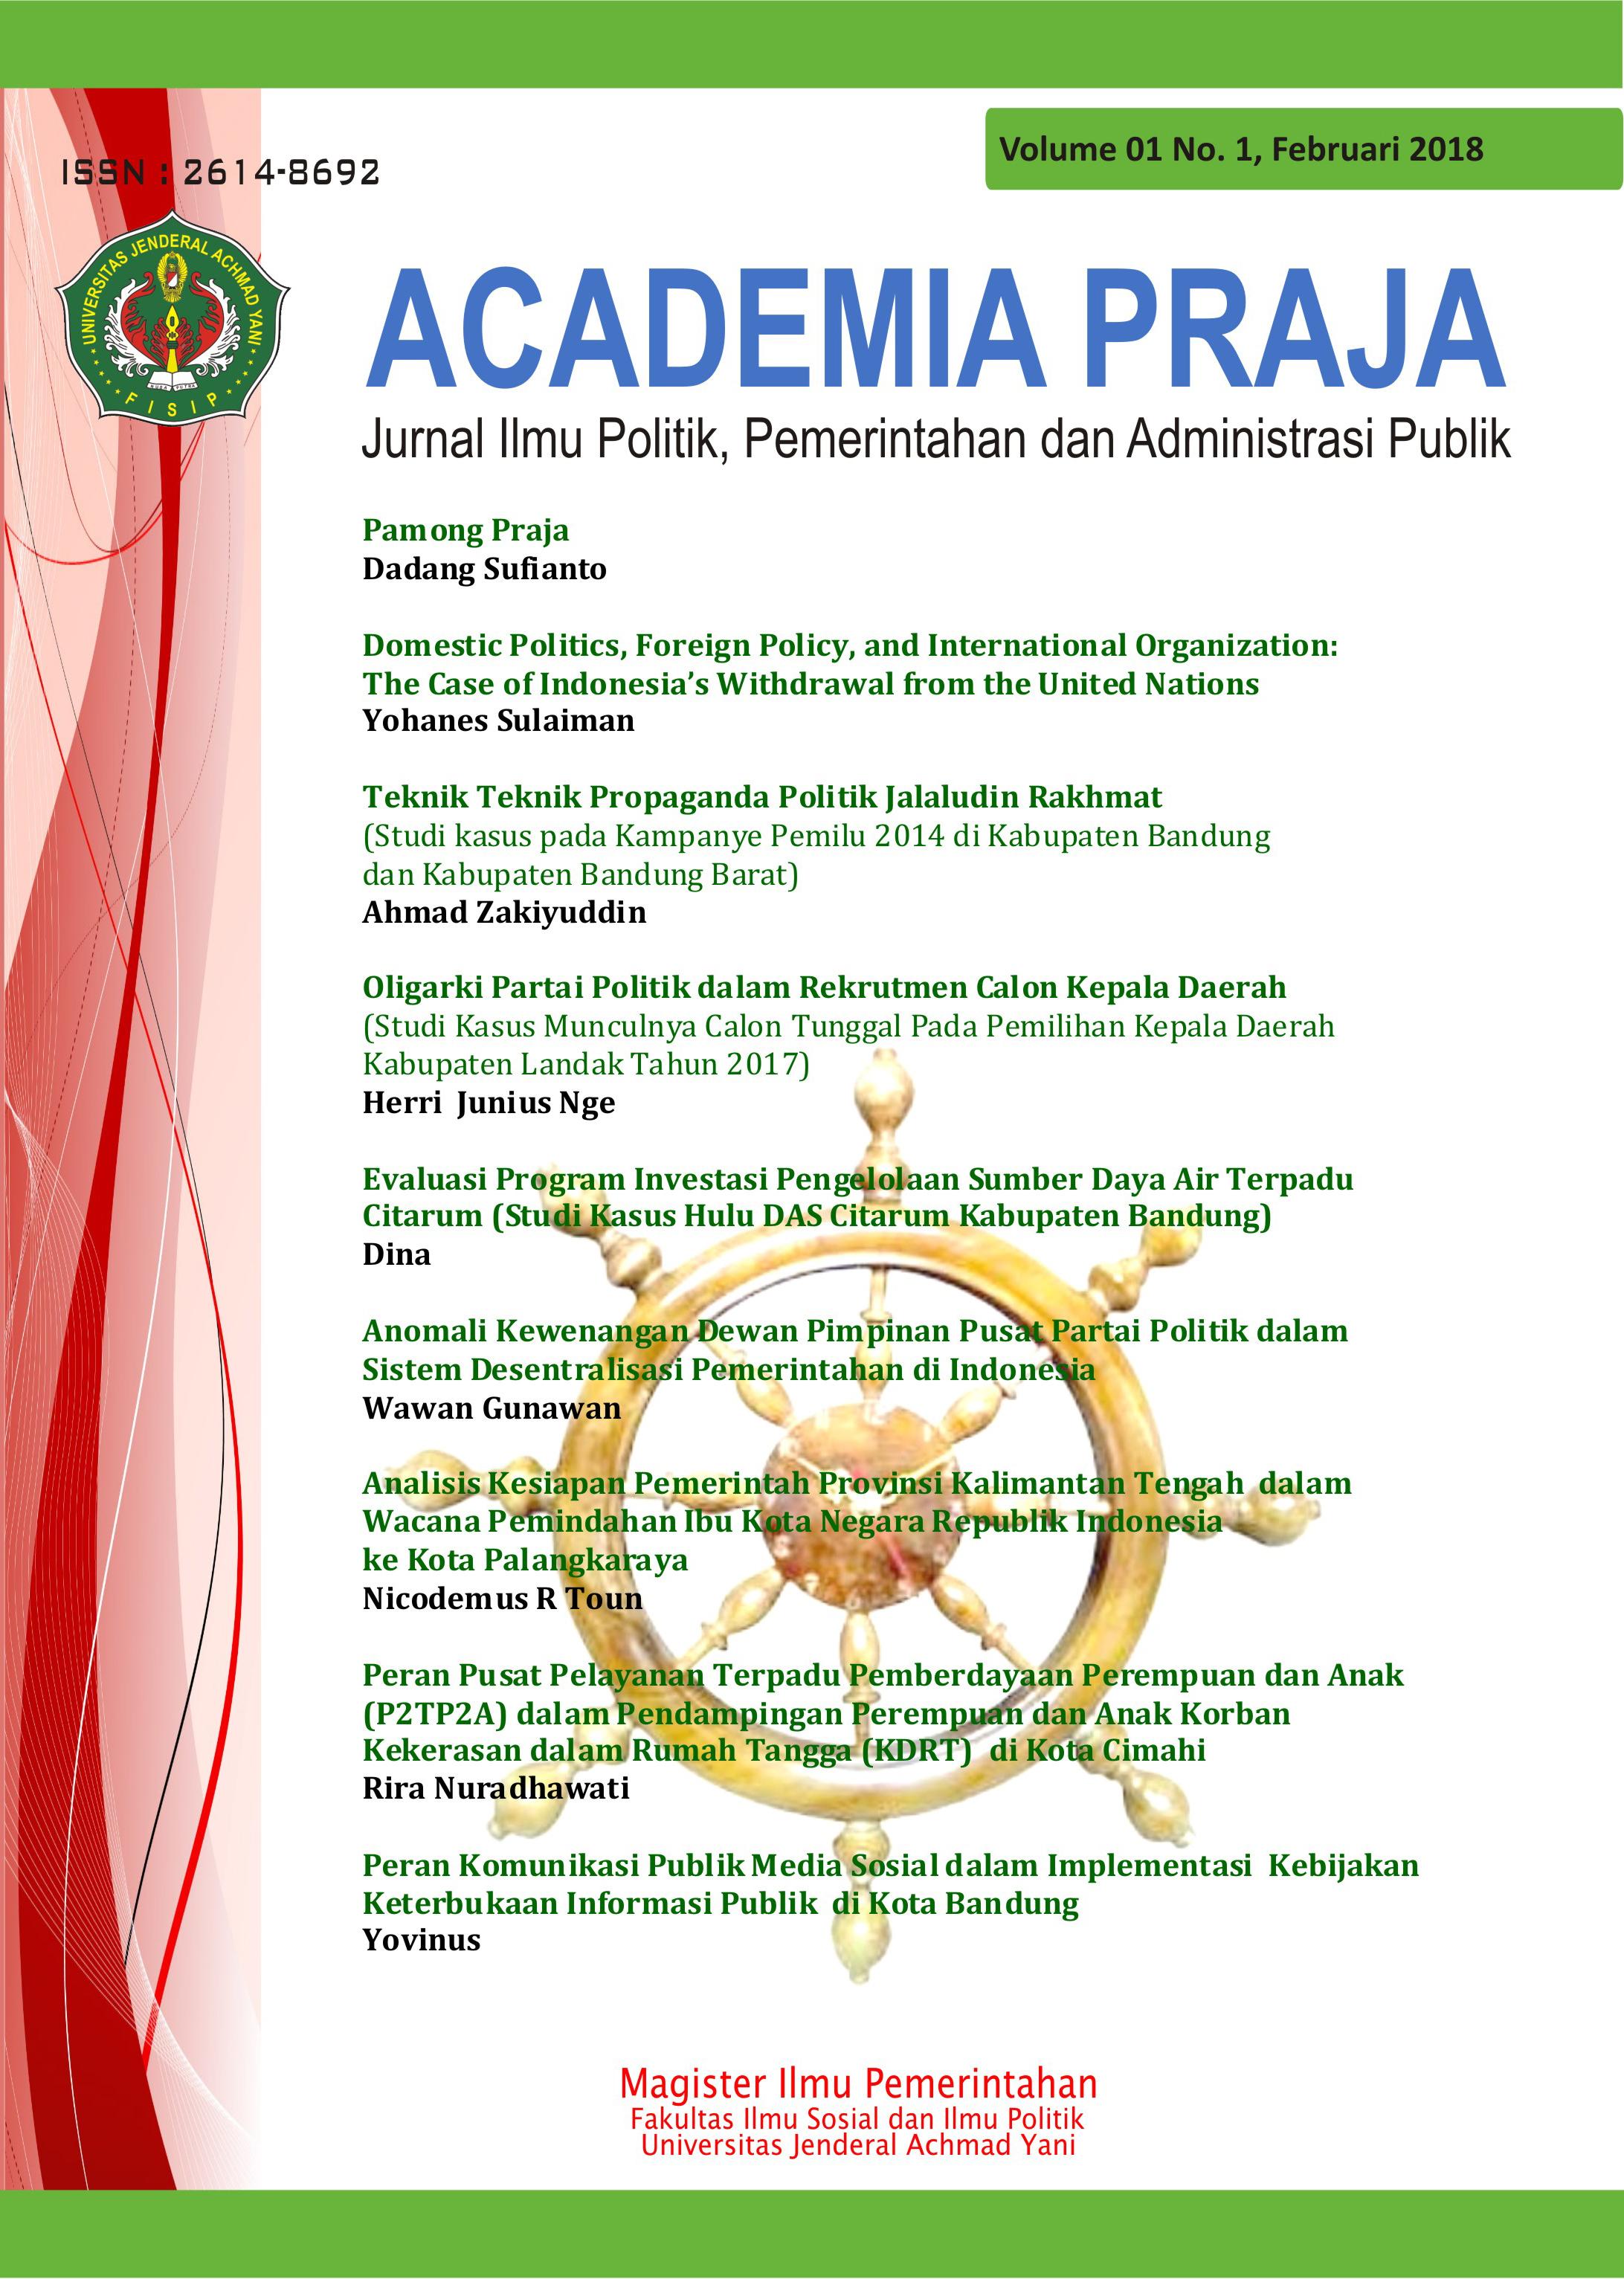 Academia Praja